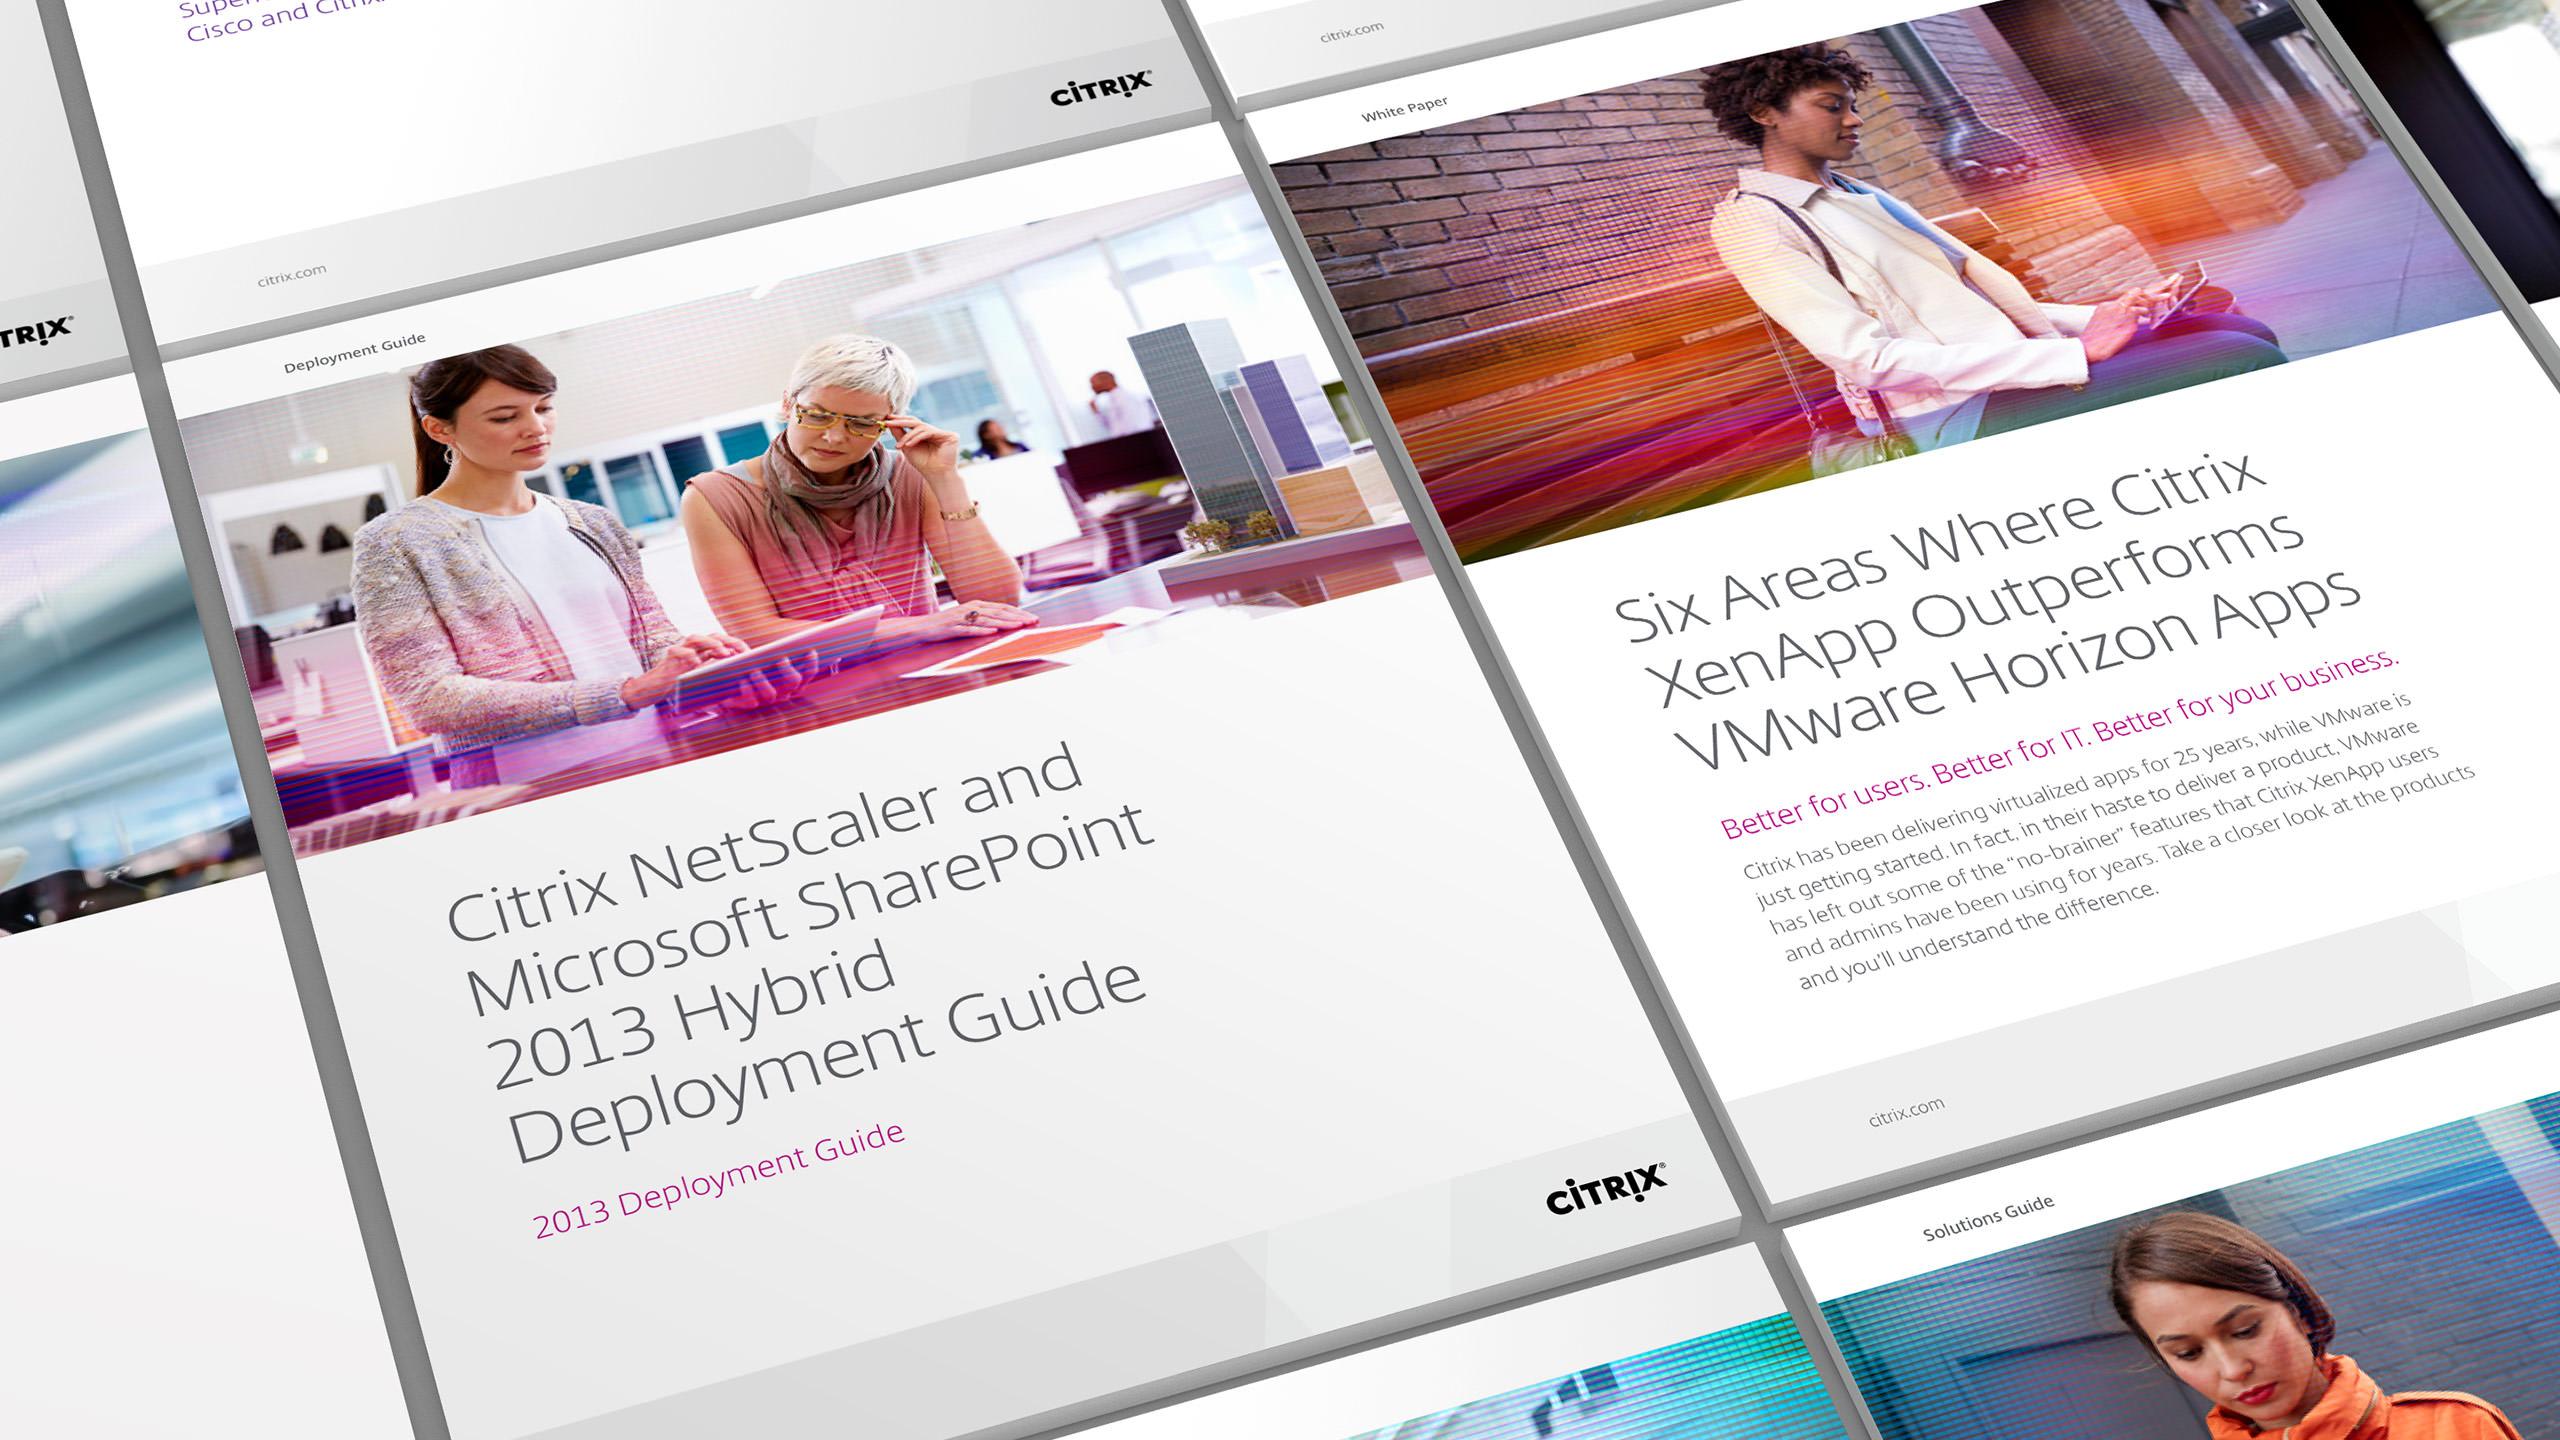 Citrix Brand Applications - White Paper